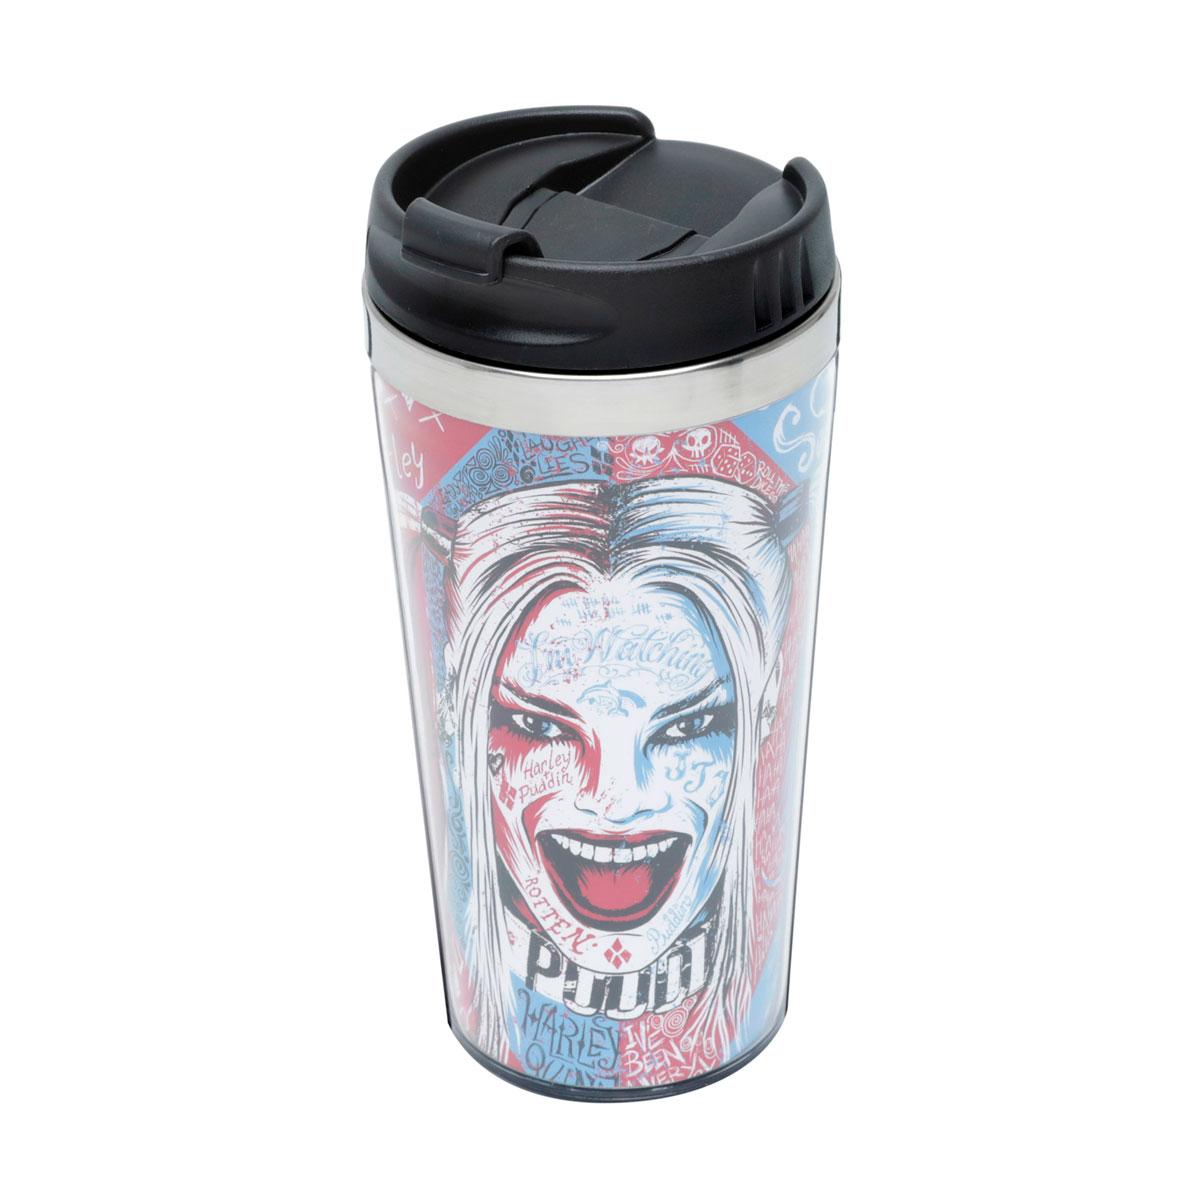 Copo Térmico Arlequina Harley Quinn Graffiti Colorido